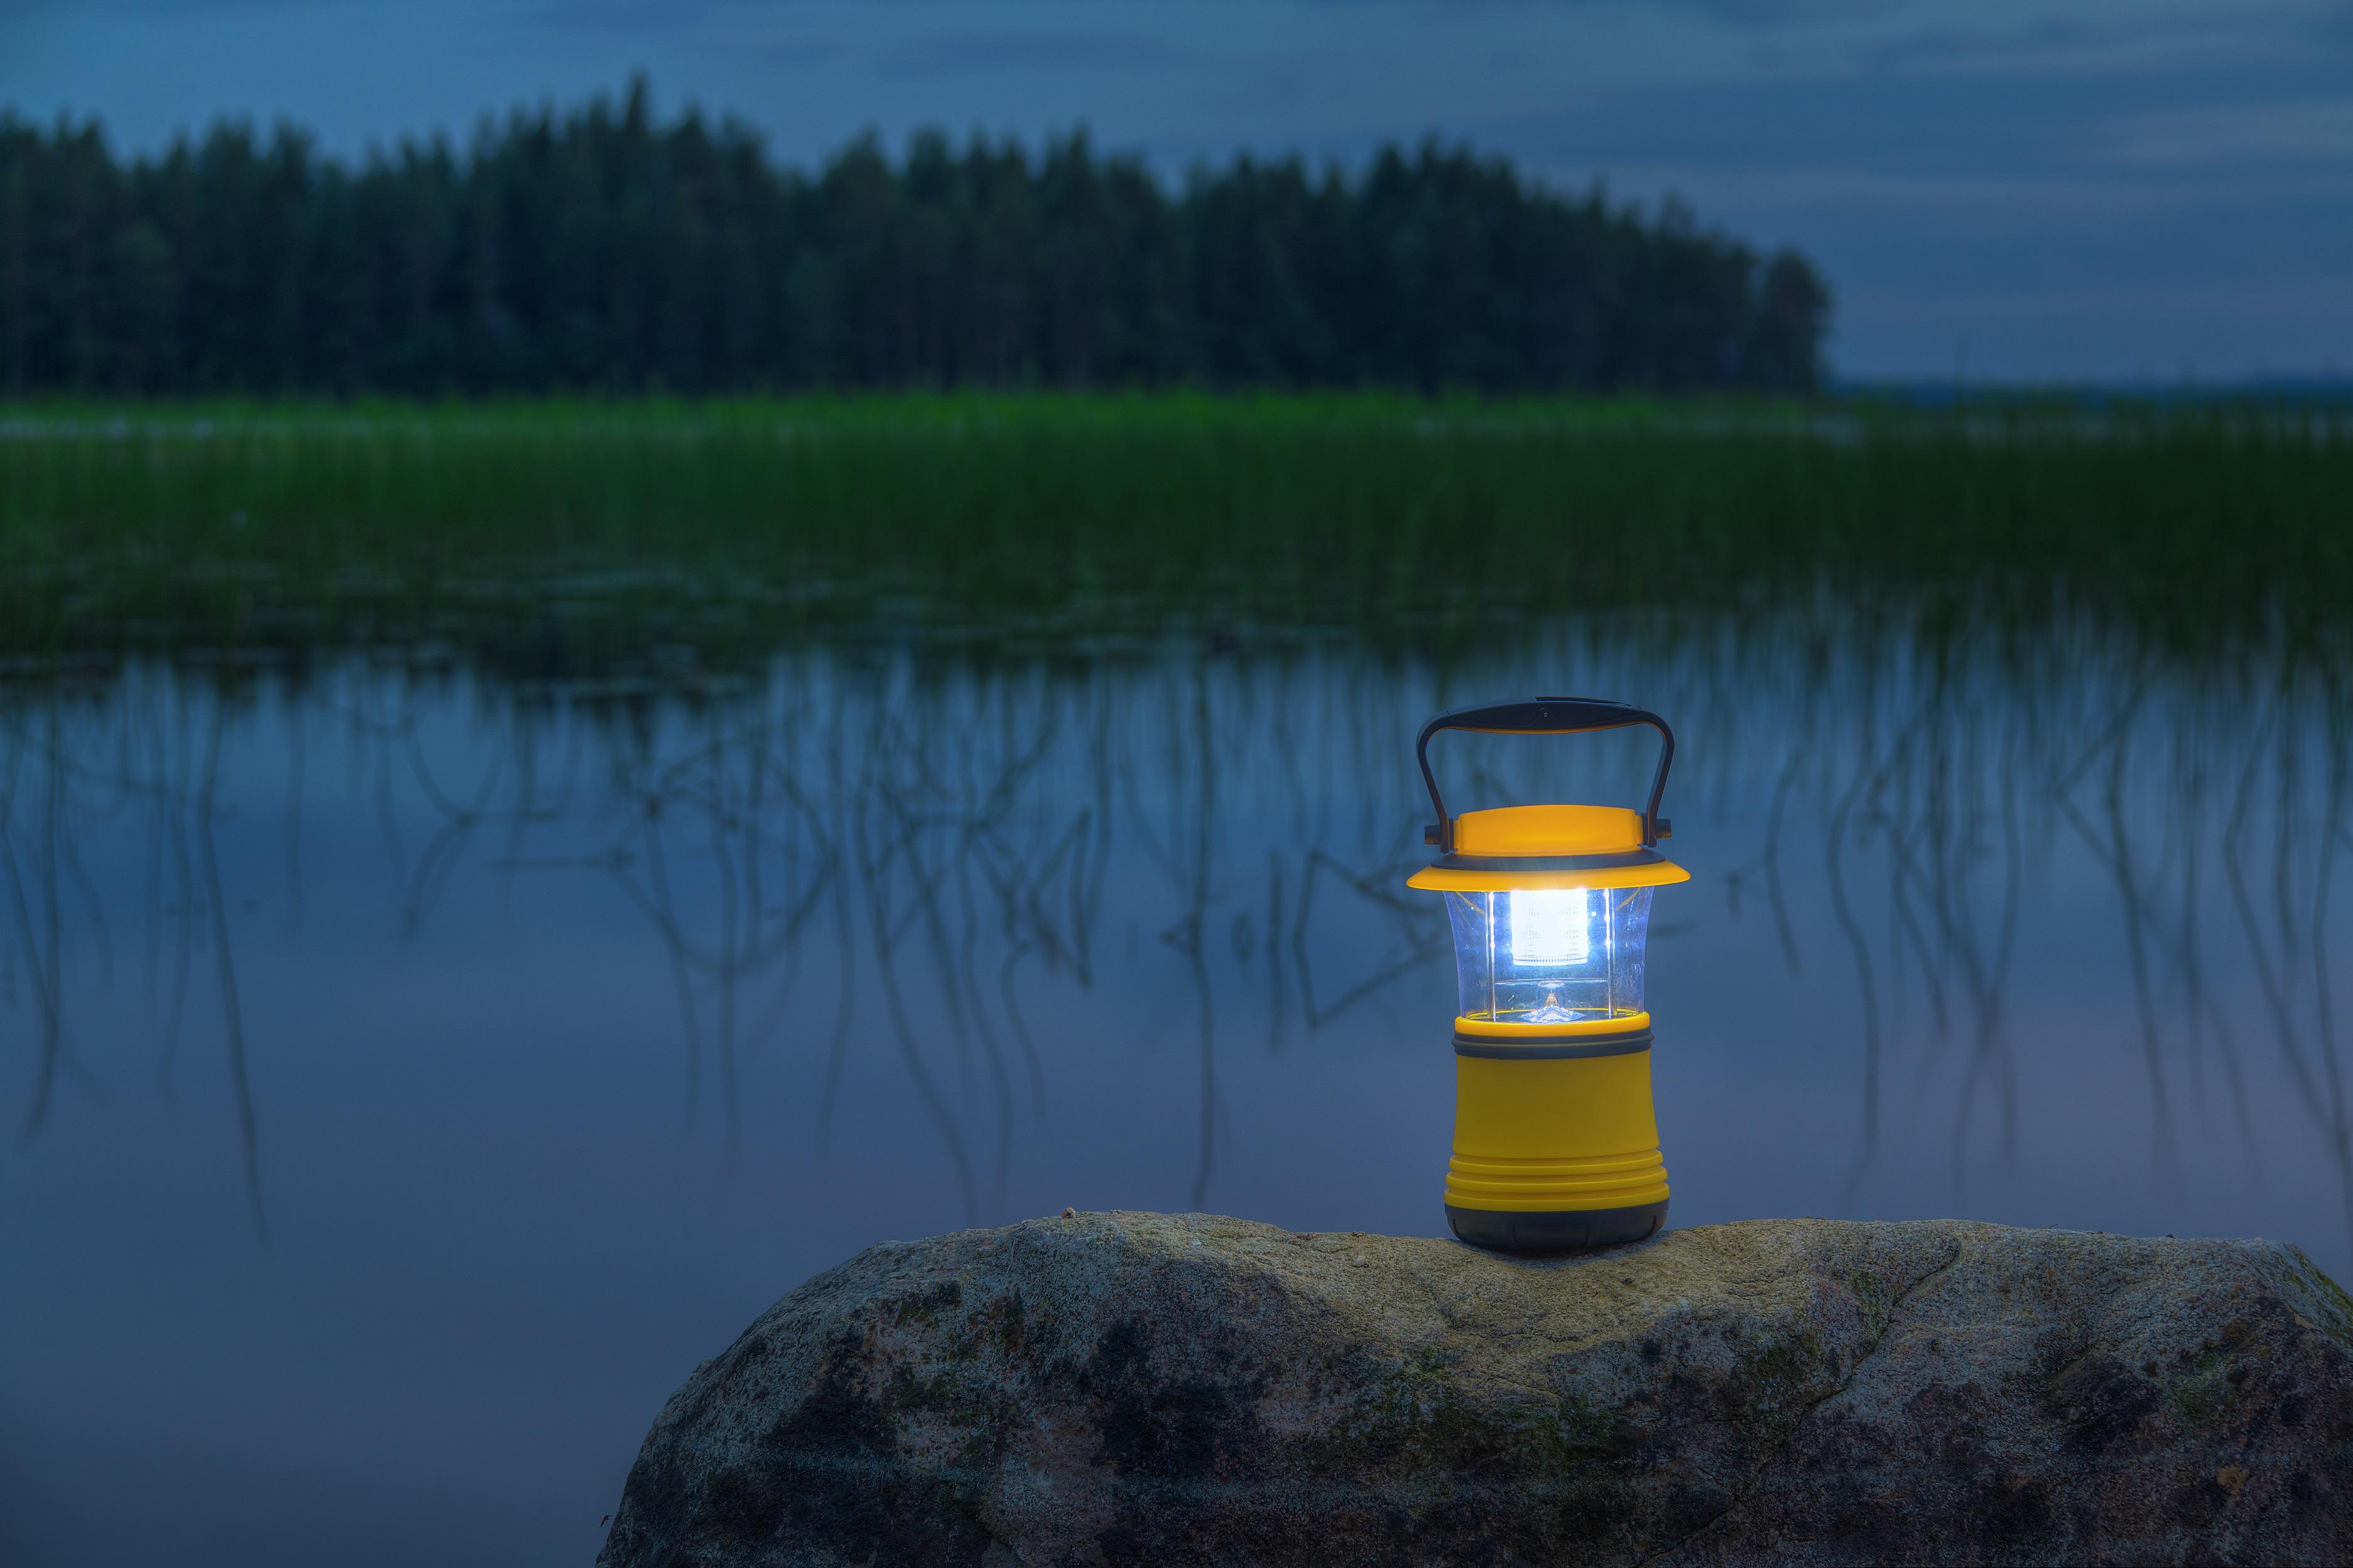 Camping Lights 7 Best Led For